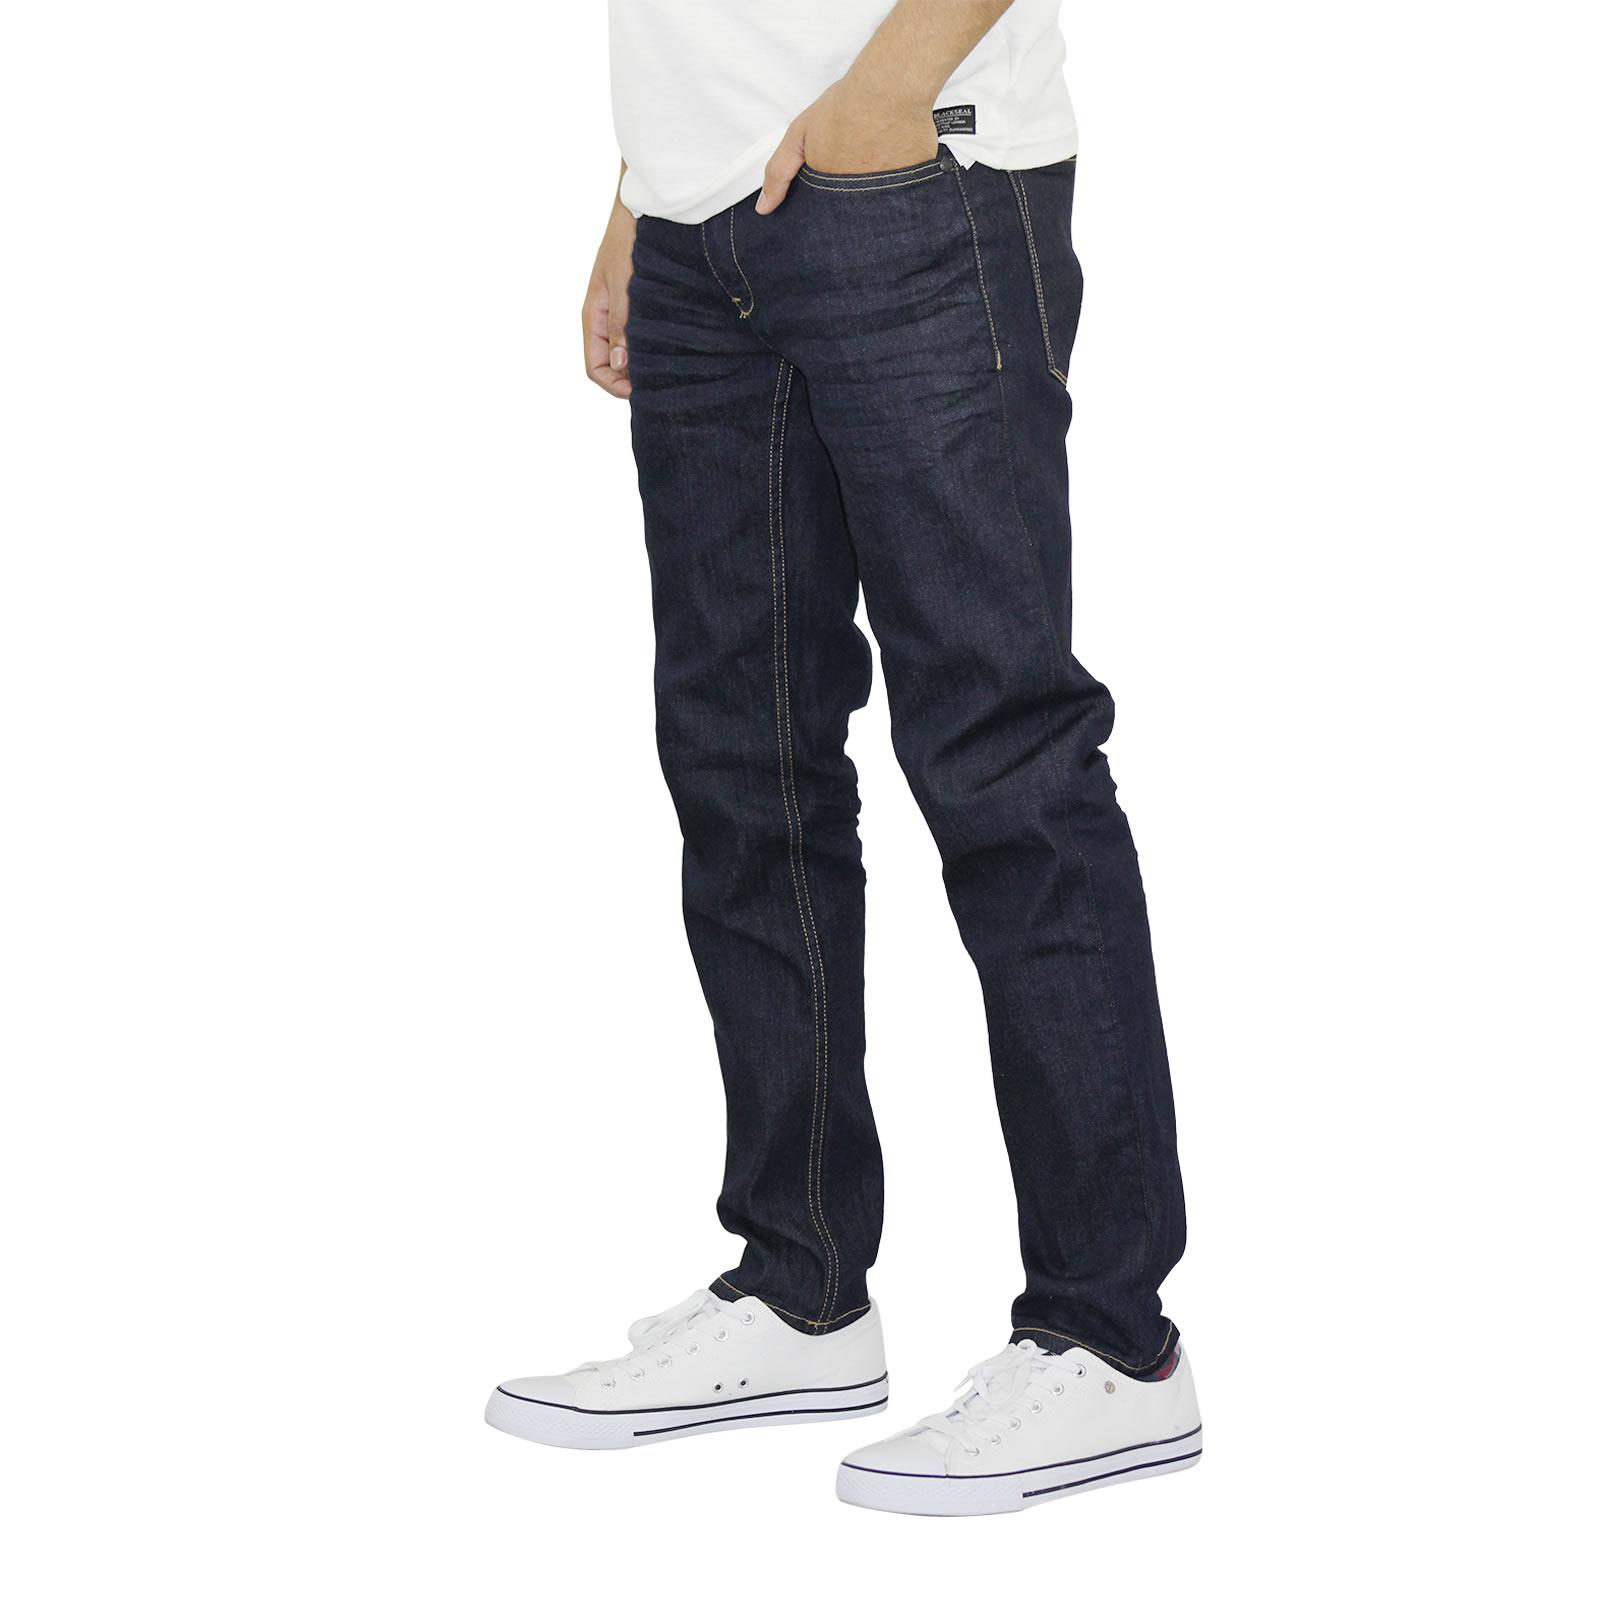 miniature 12 - Homme-Crosshatch-Jaco-Slim-Jeans-stretch-pantalon-denim-effet-vieilli